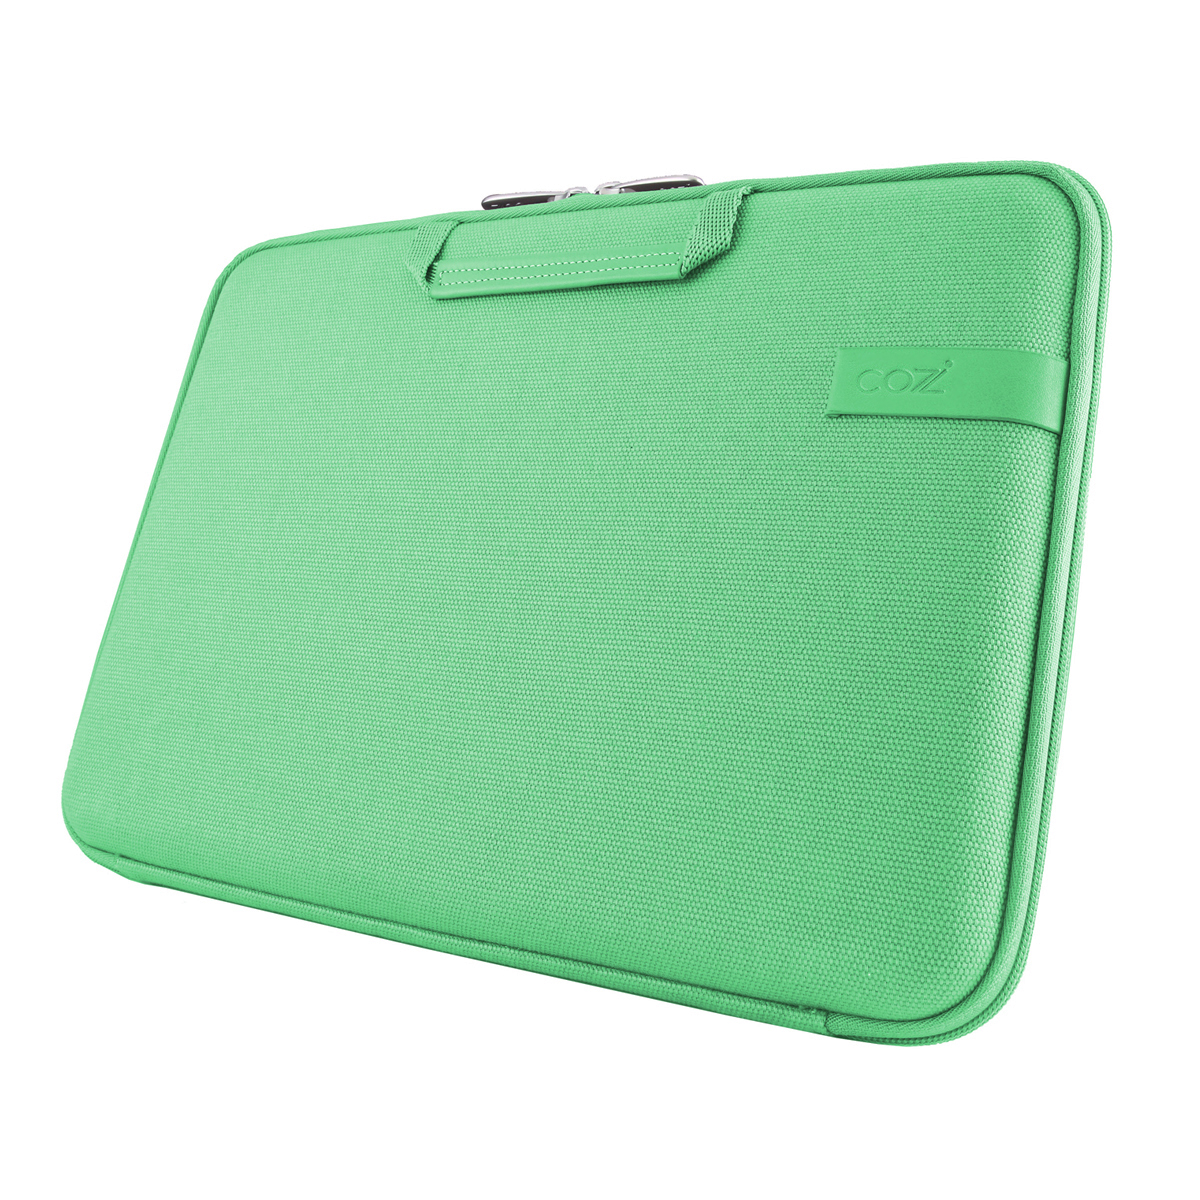 Cozistyle 13吋 Macbook Air /Macbook Pro(Retina) 智能散熱防潑水手提硬殼電腦保護套-帆布蘋果綠